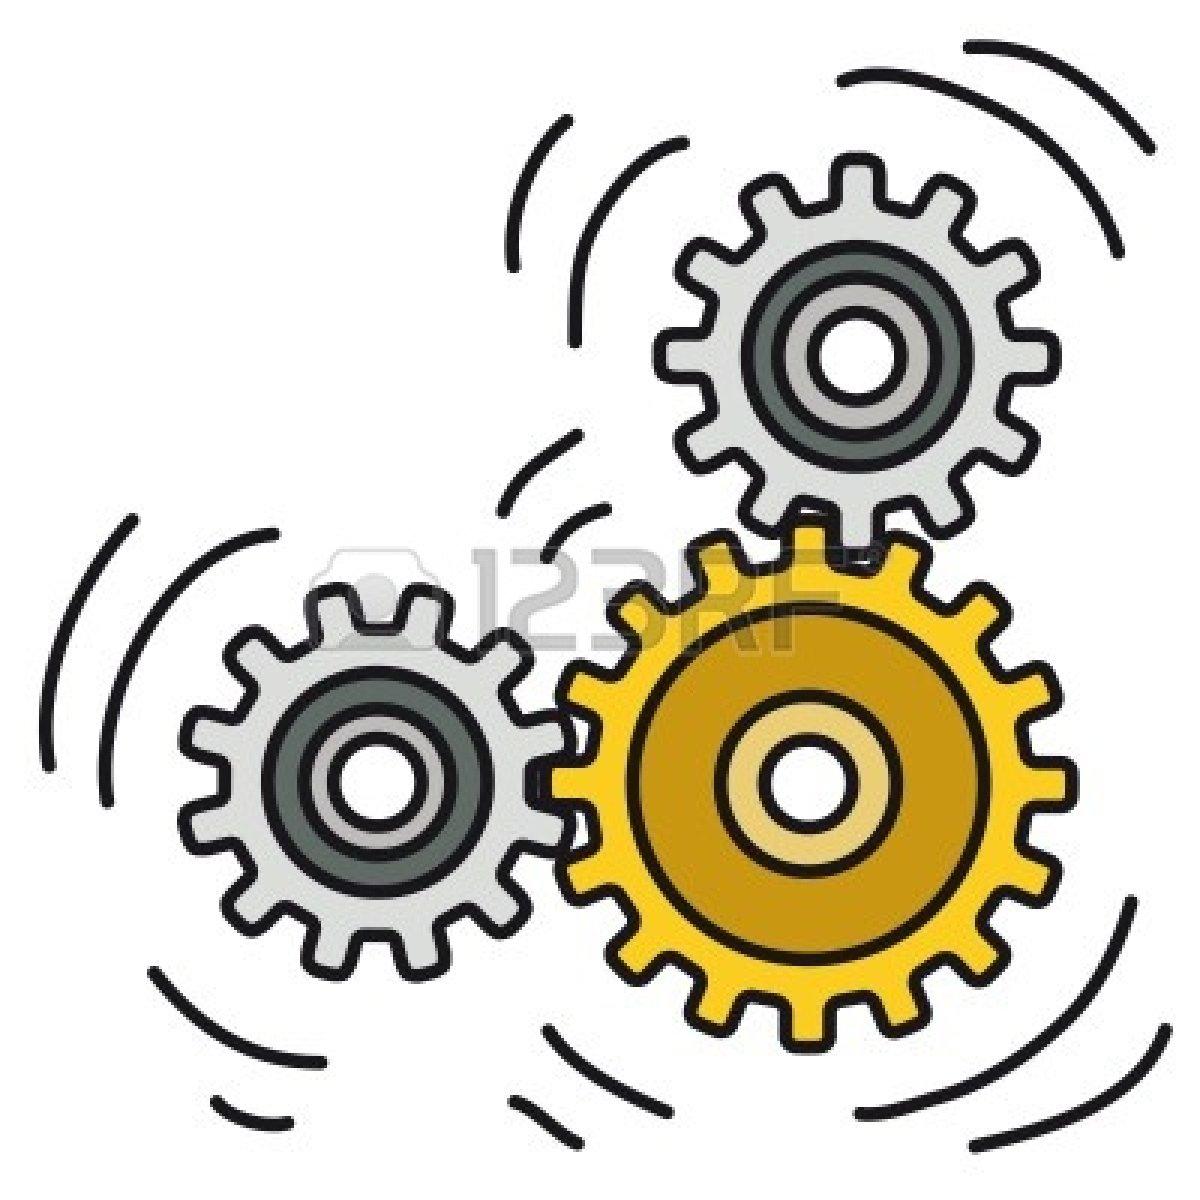 Clockwork clipart mechanical engineering Clipart Clipart Images mechanical%20engineer%20clipart Engineer